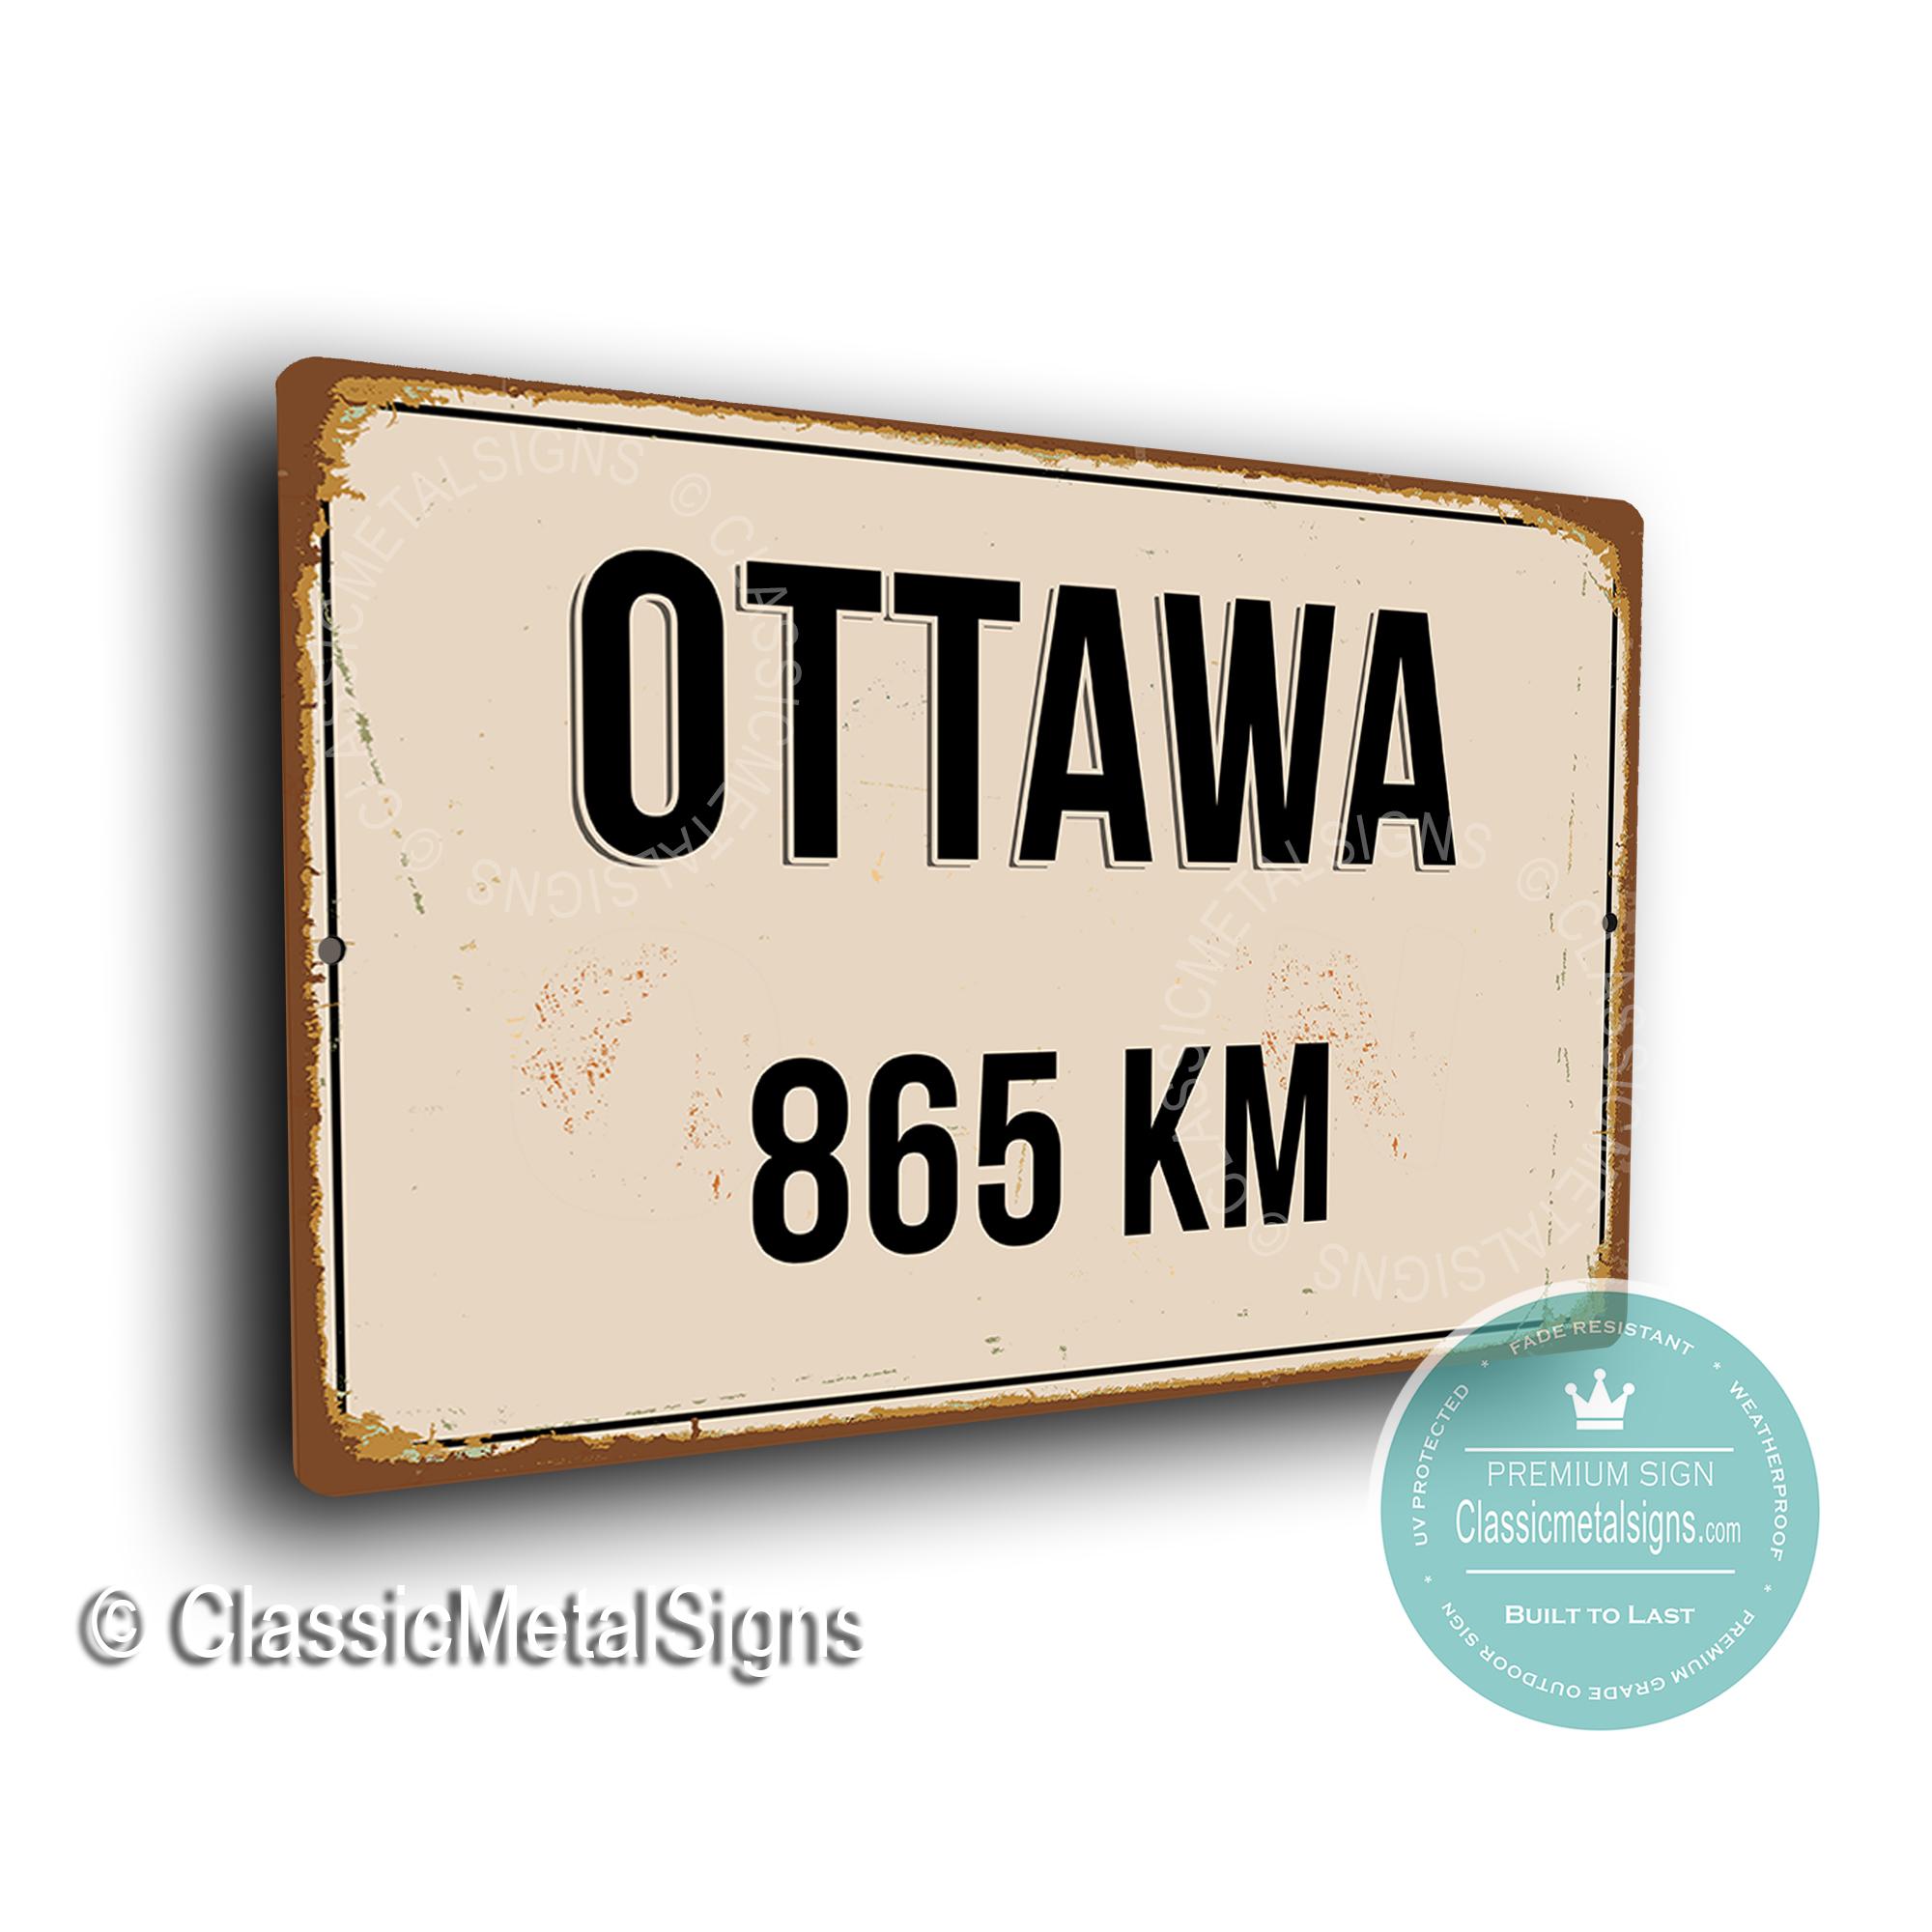 Ottawa Street Sign